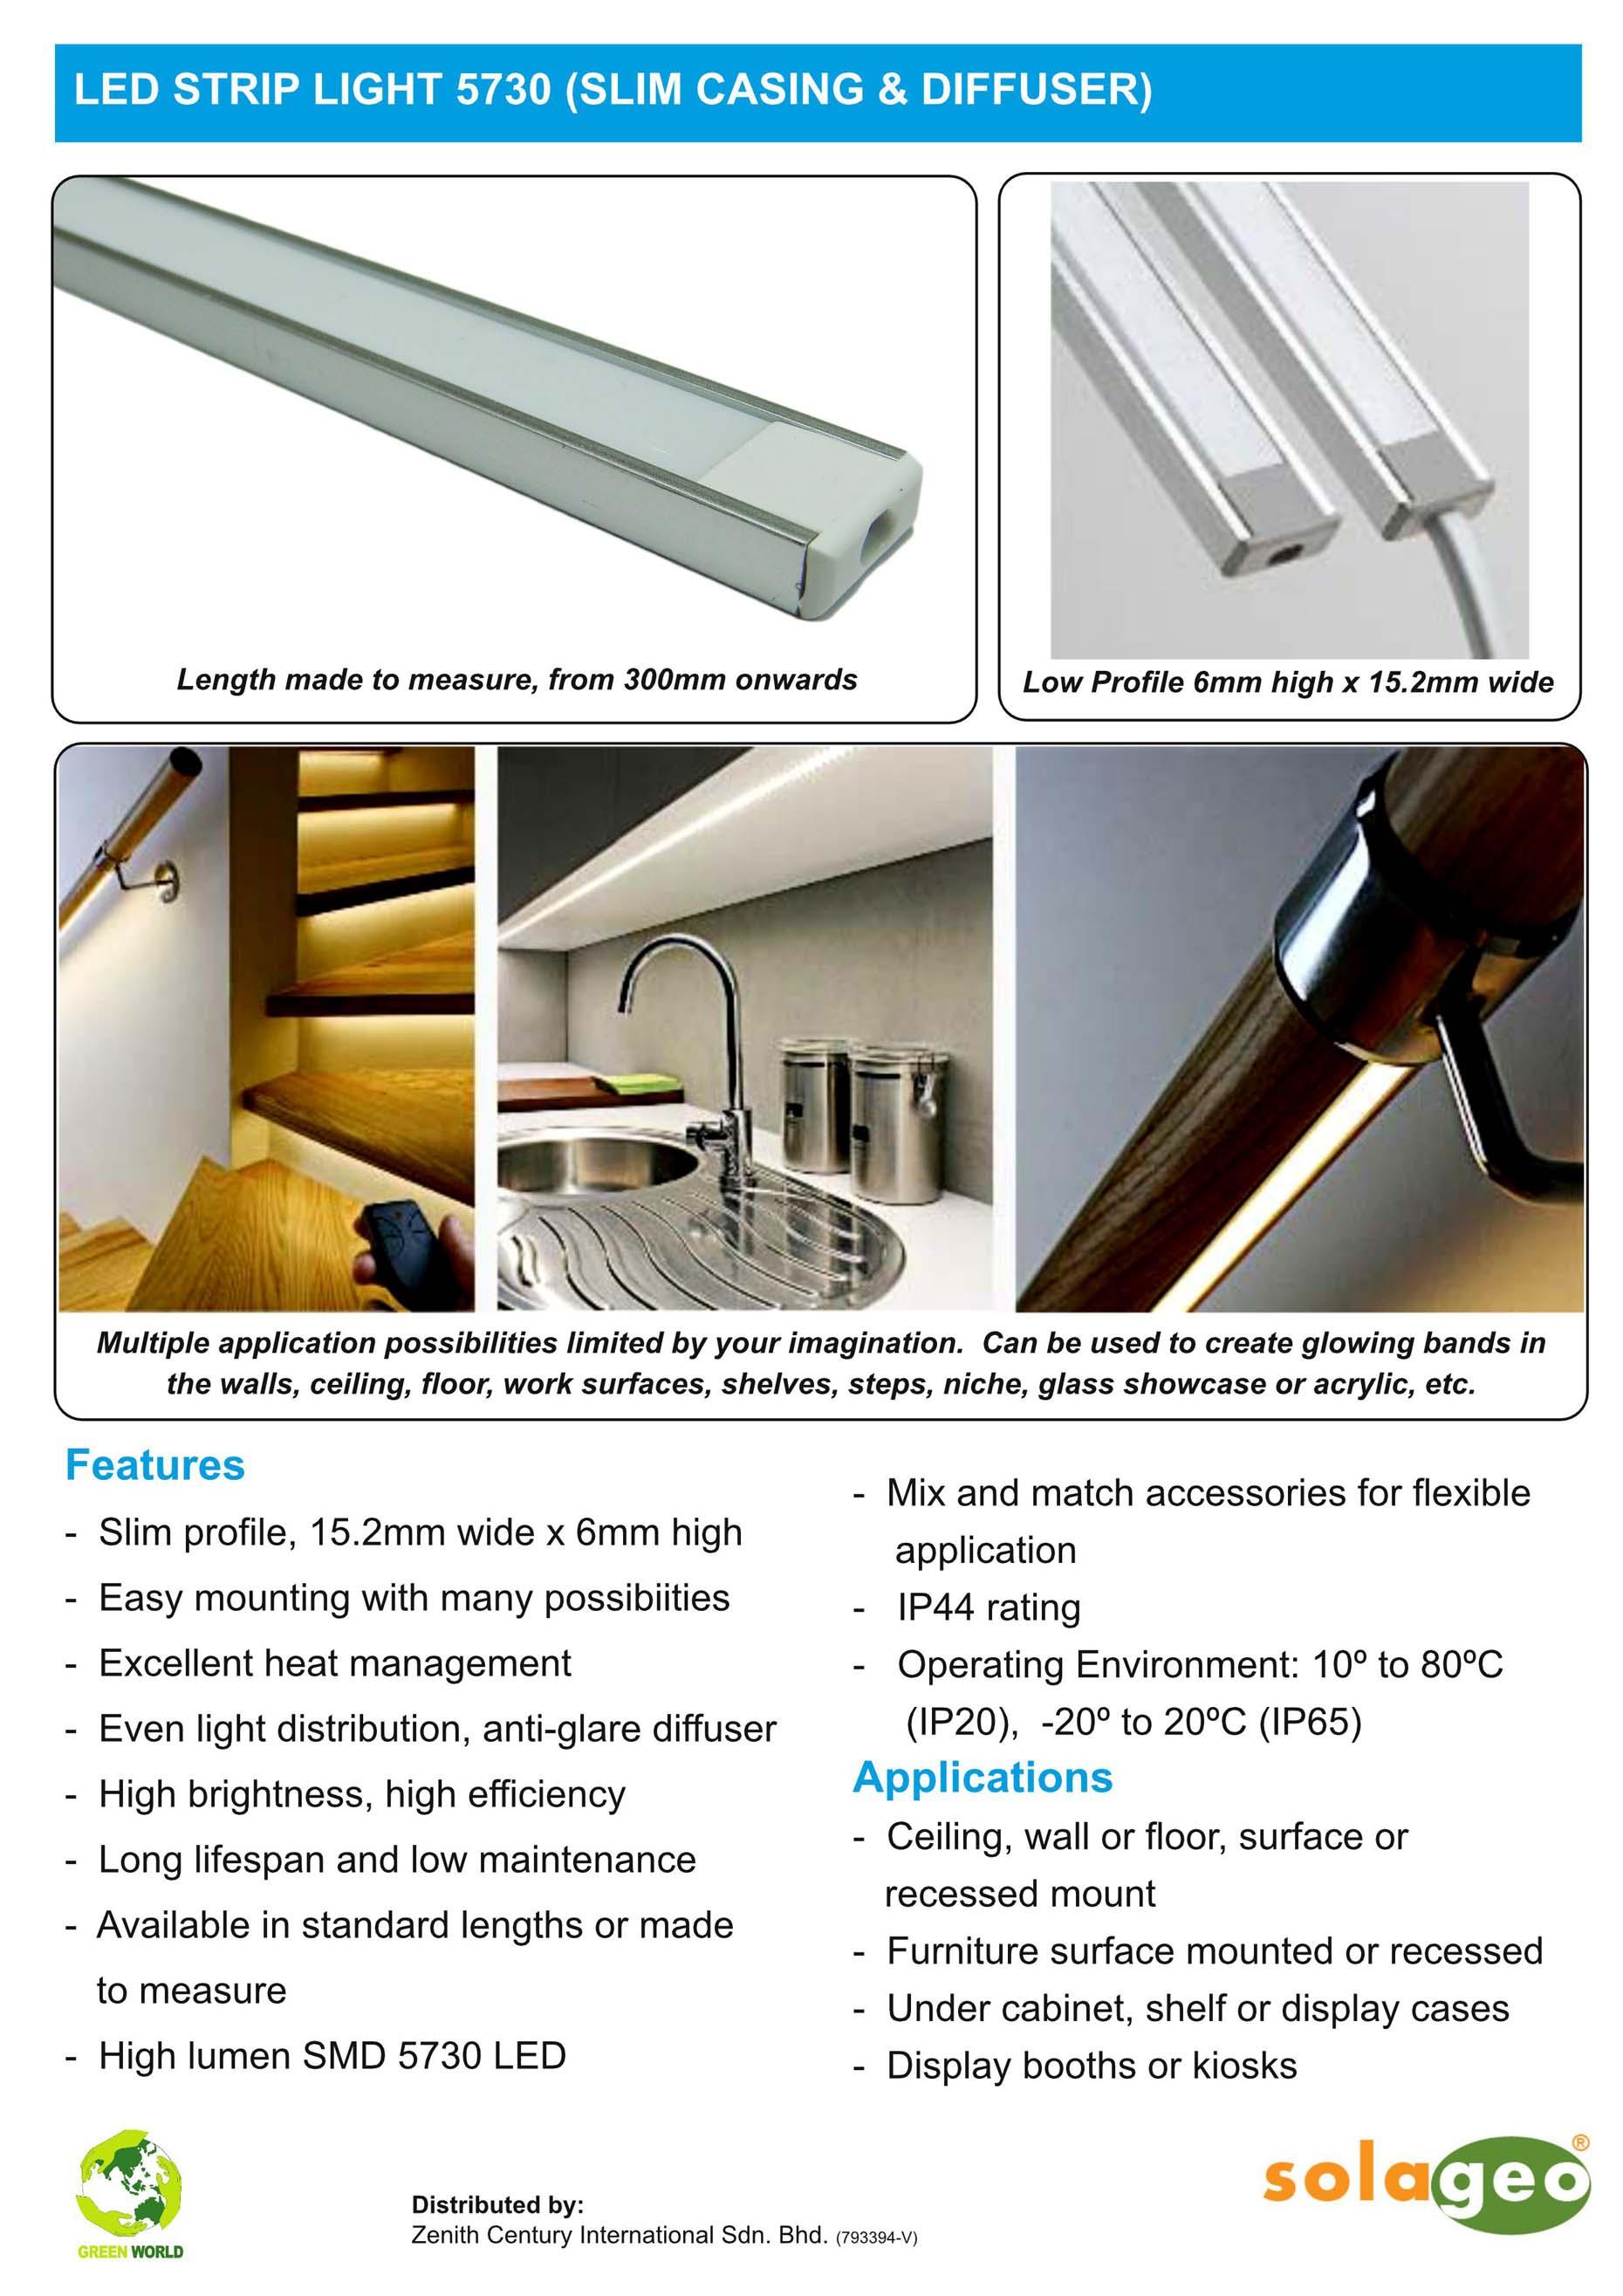 Led strip light 5730 slim casing diffuser zenith century download mozeypictures Images